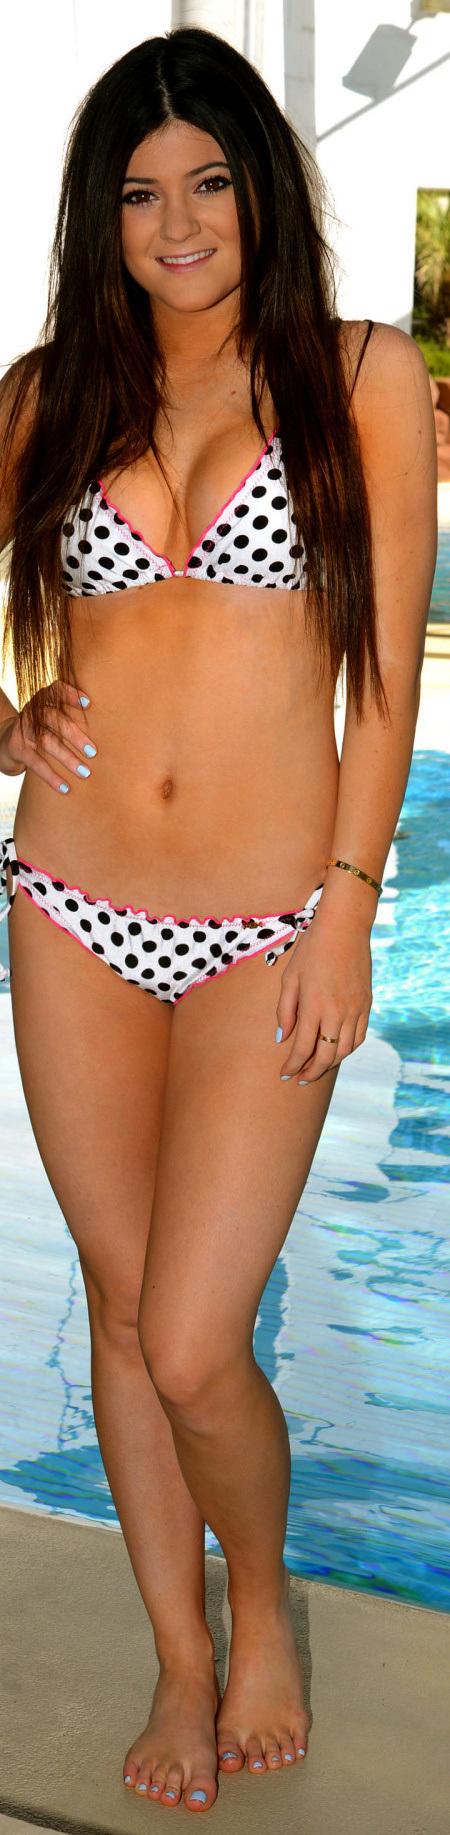 expostas_com_kylie_jenner_modeling_a_kardashian_khaos_bikini_at_mirage_hotel_pool-1-1